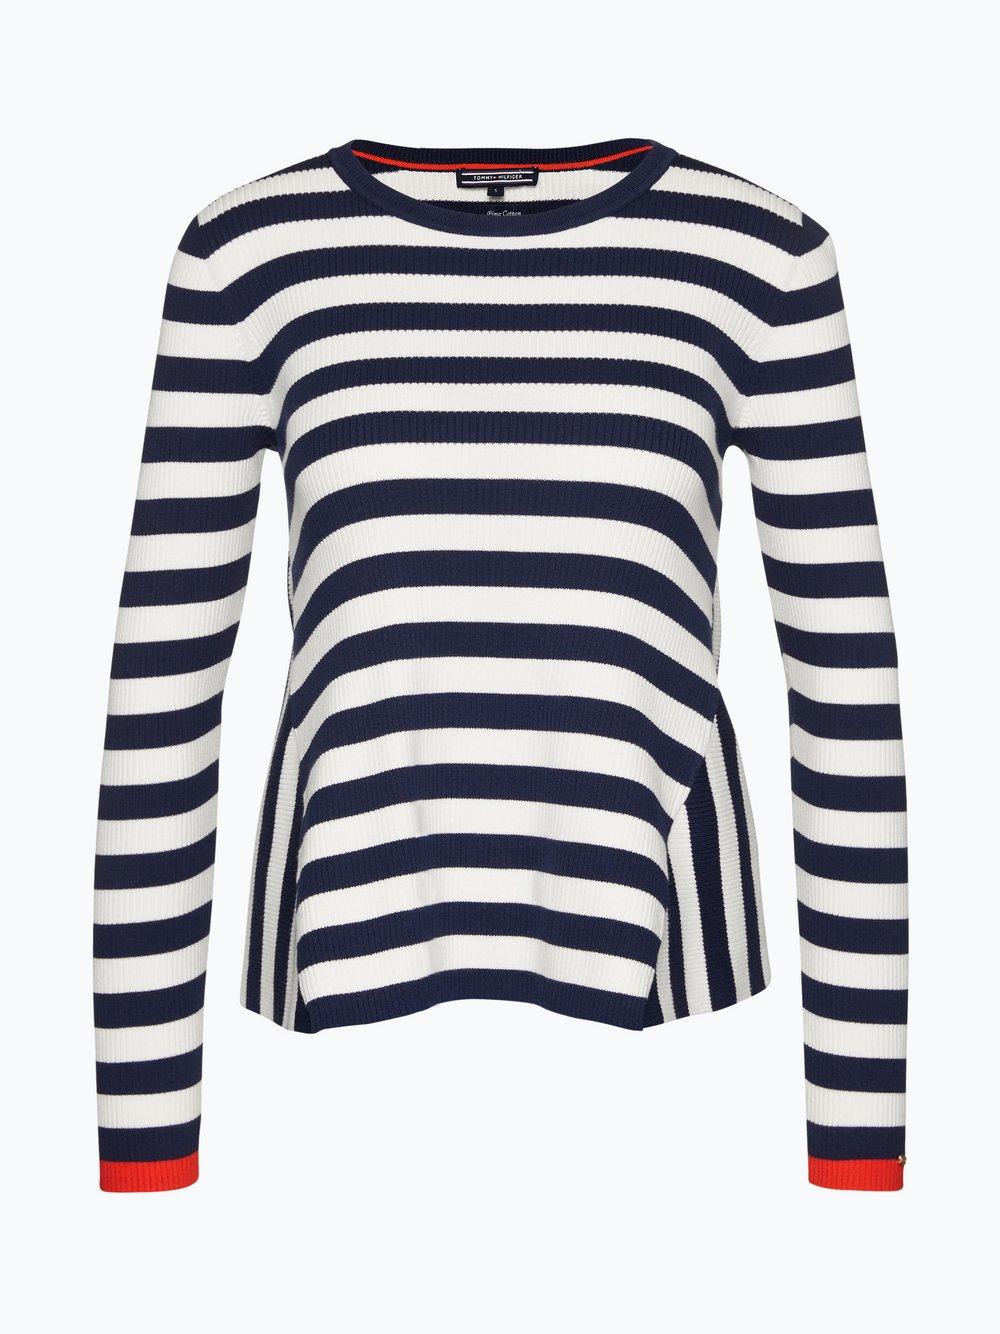 5add89e849 Tommy Hilfiger Damen Pullover - Etty online kaufen | VANGRAAF.COM